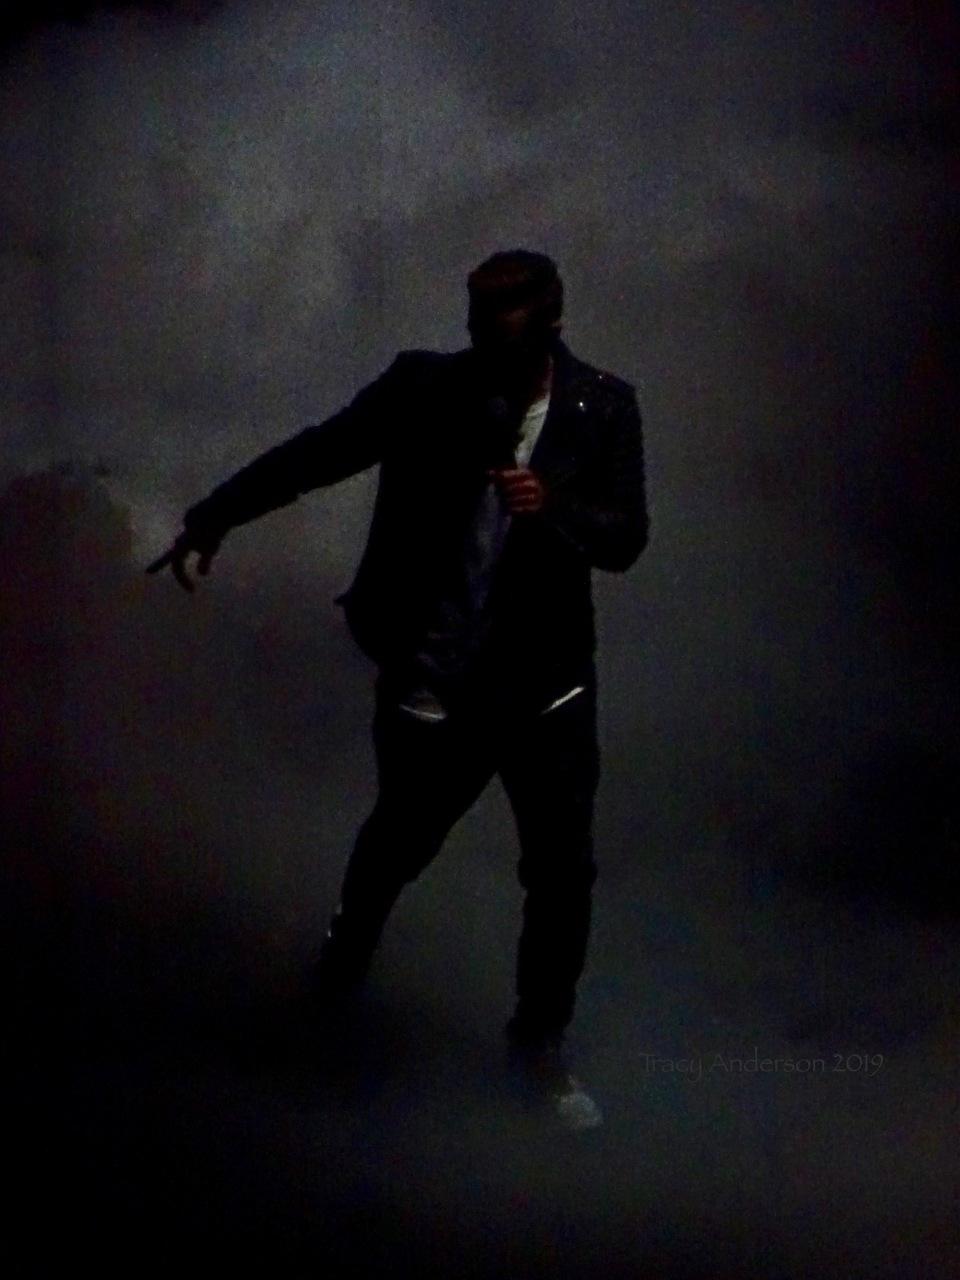 Justin Timberlake Man Of The Woods Smoke Rogers Place Feb 6 2019